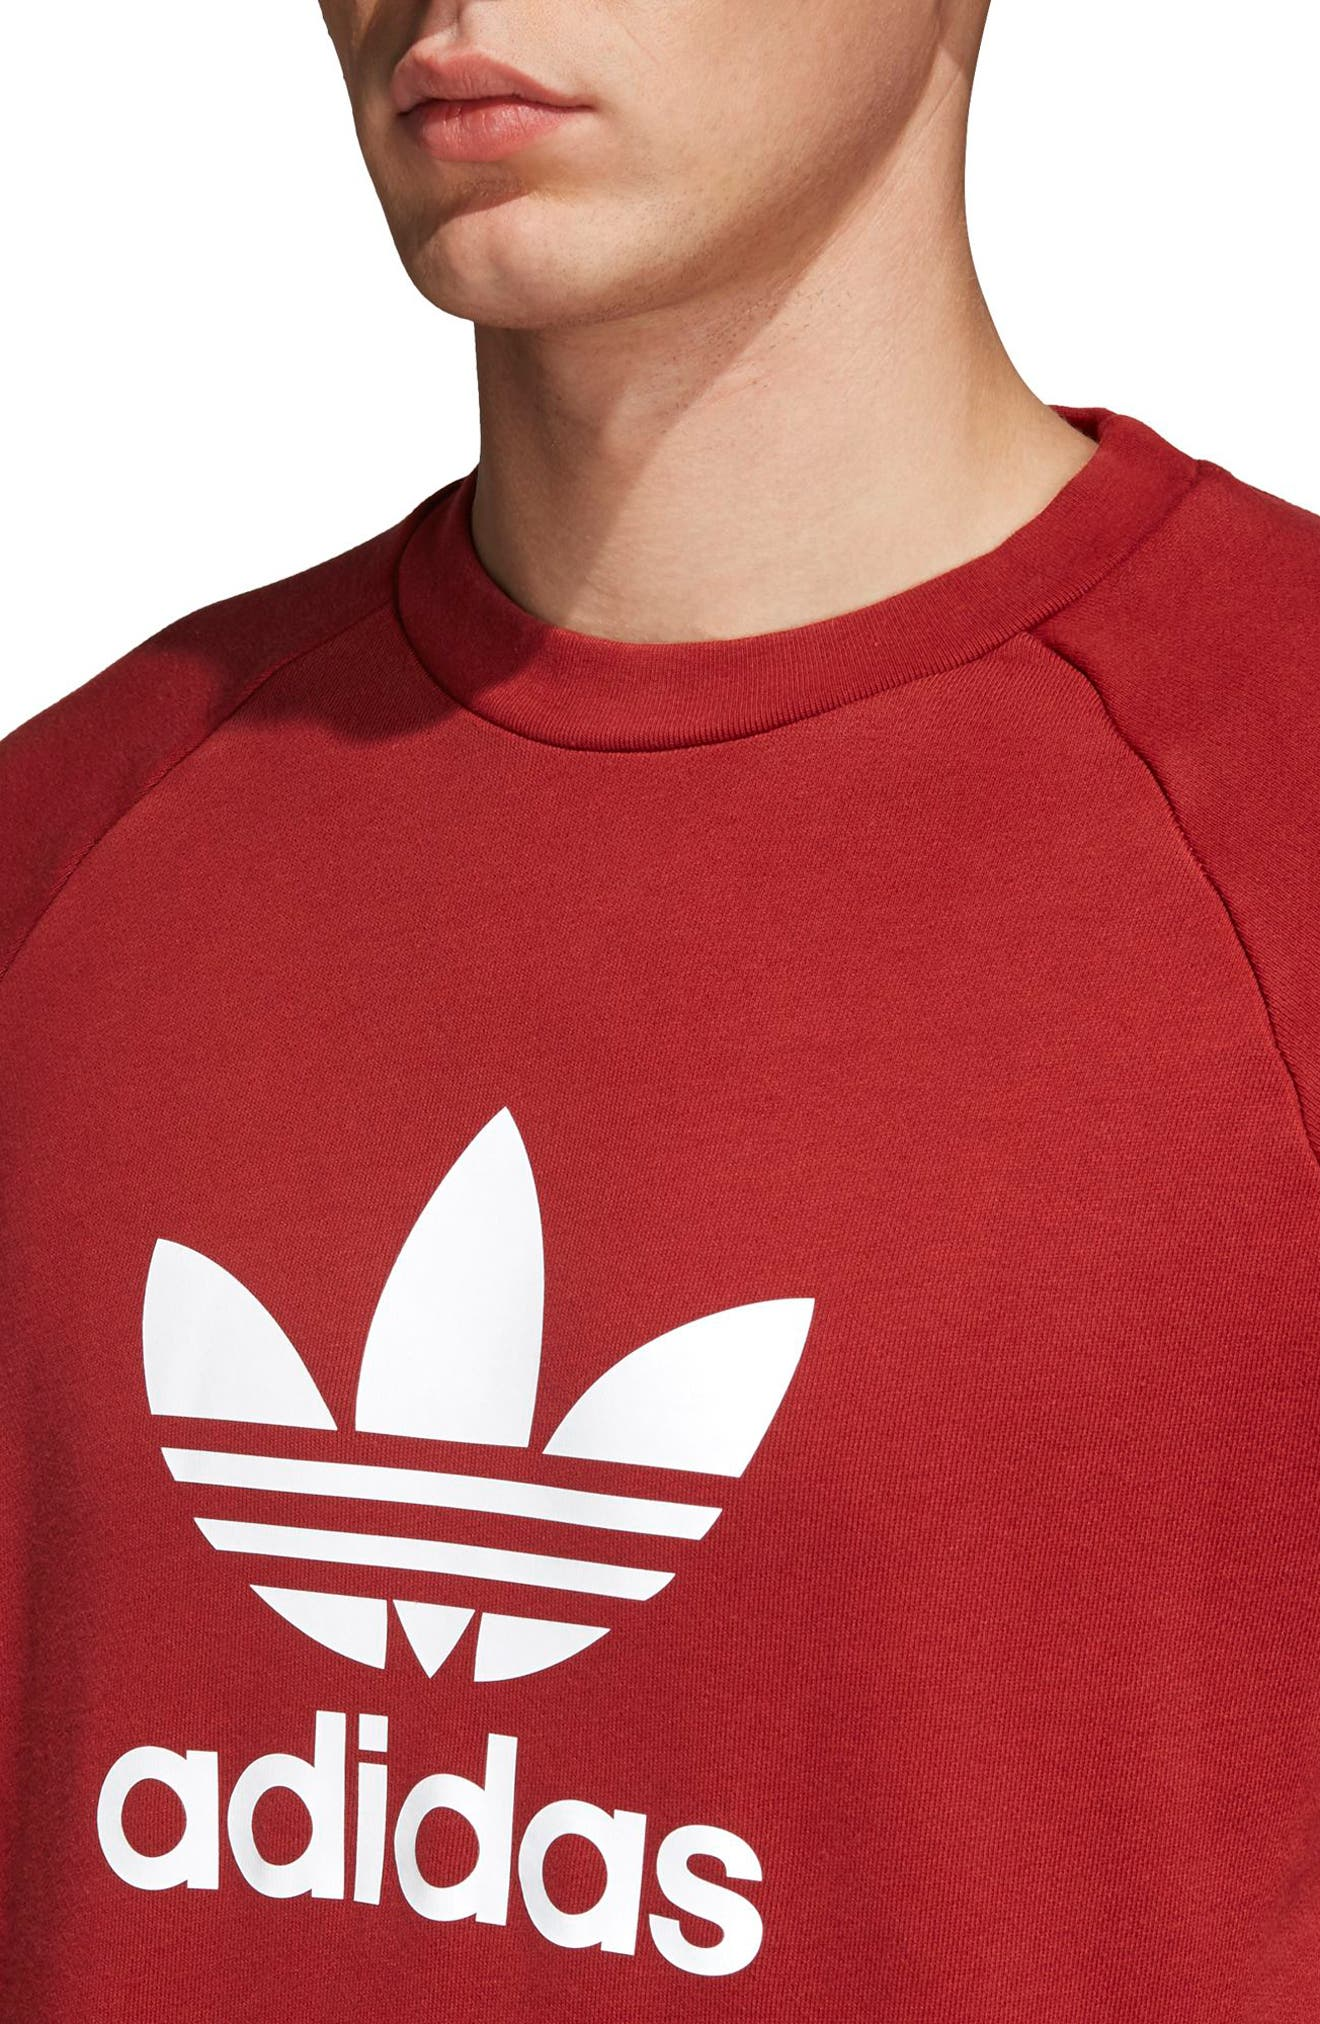 adidas Trefoil Crewneck Sweatshirt,                             Alternate thumbnail 3, color,                             Rusred